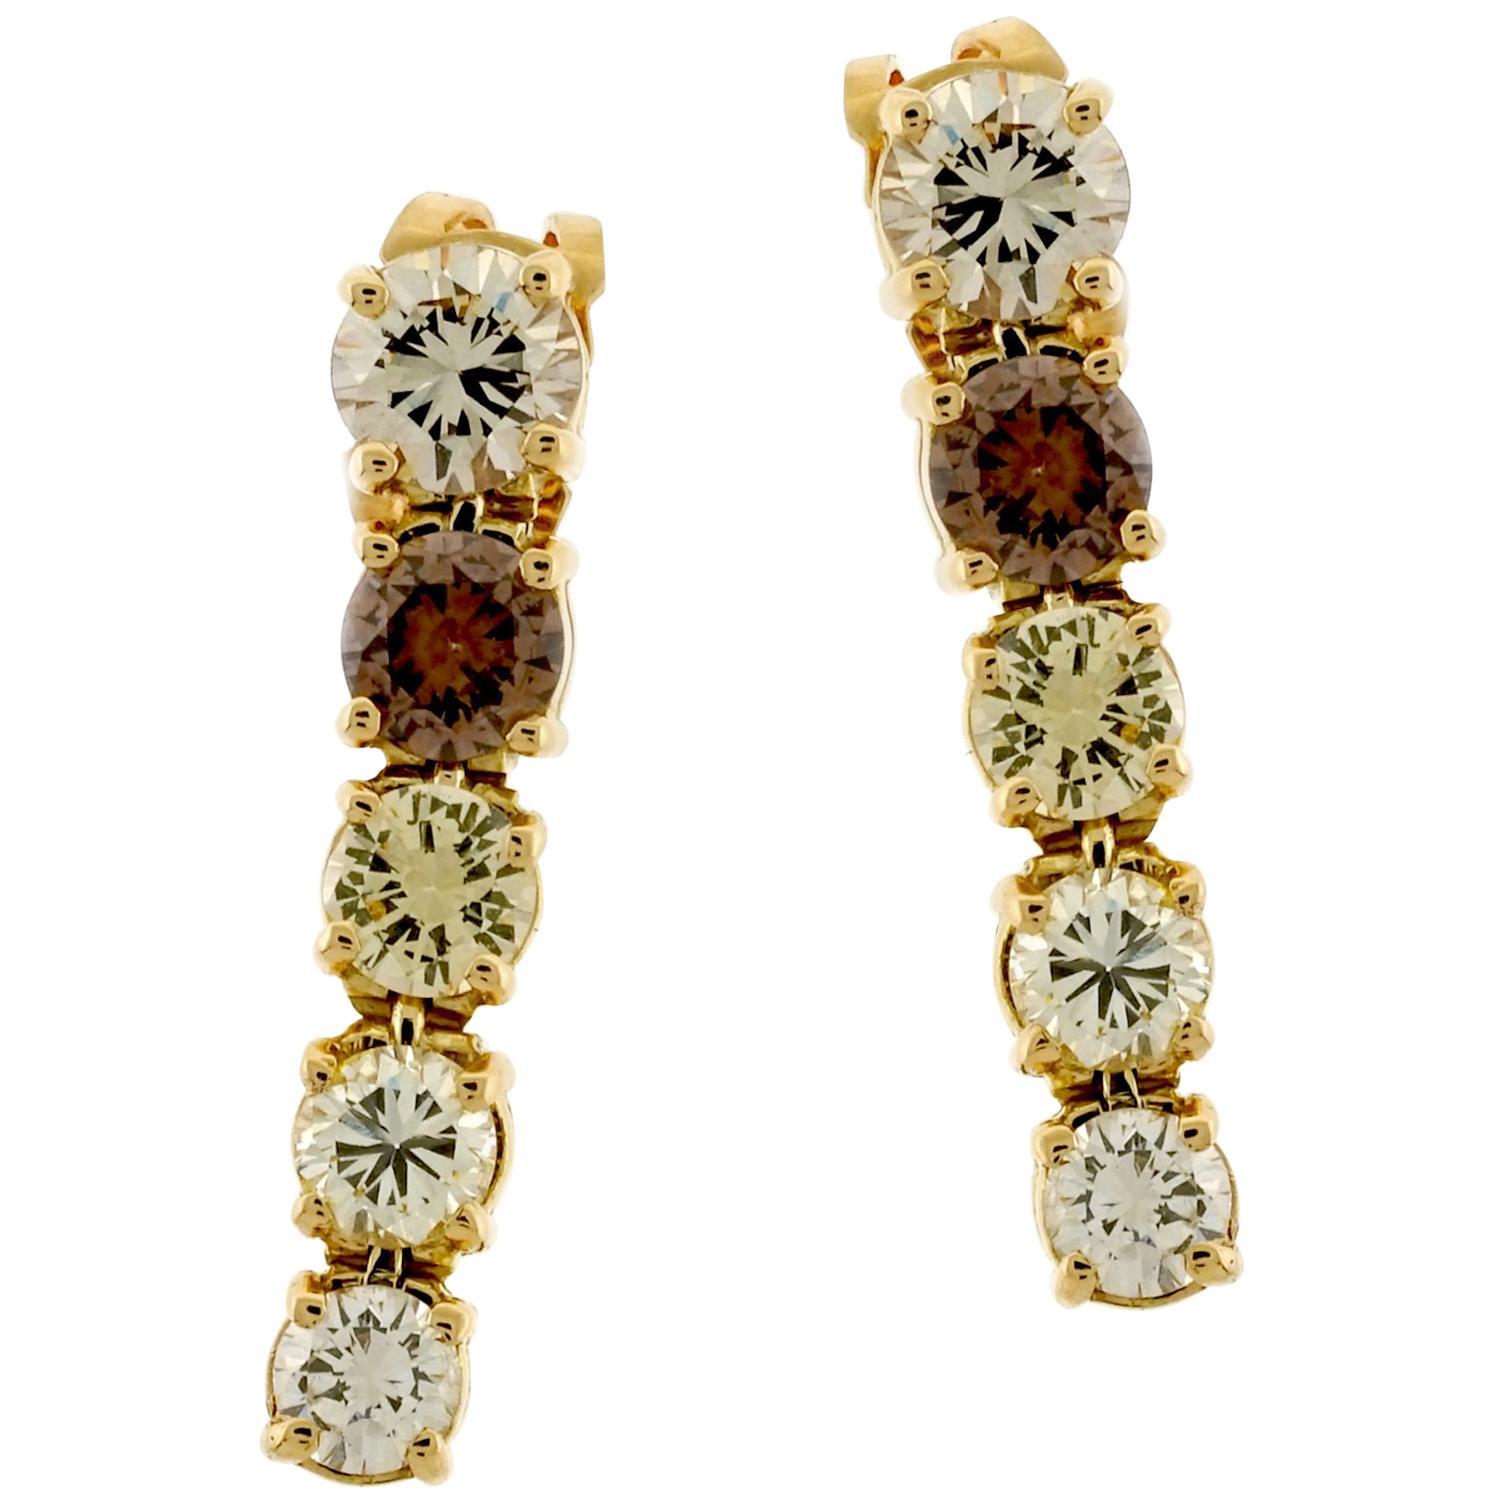 Kurt Wayne Multicolored Diamond Drop Earrings in 18 Karat Yellow Gold